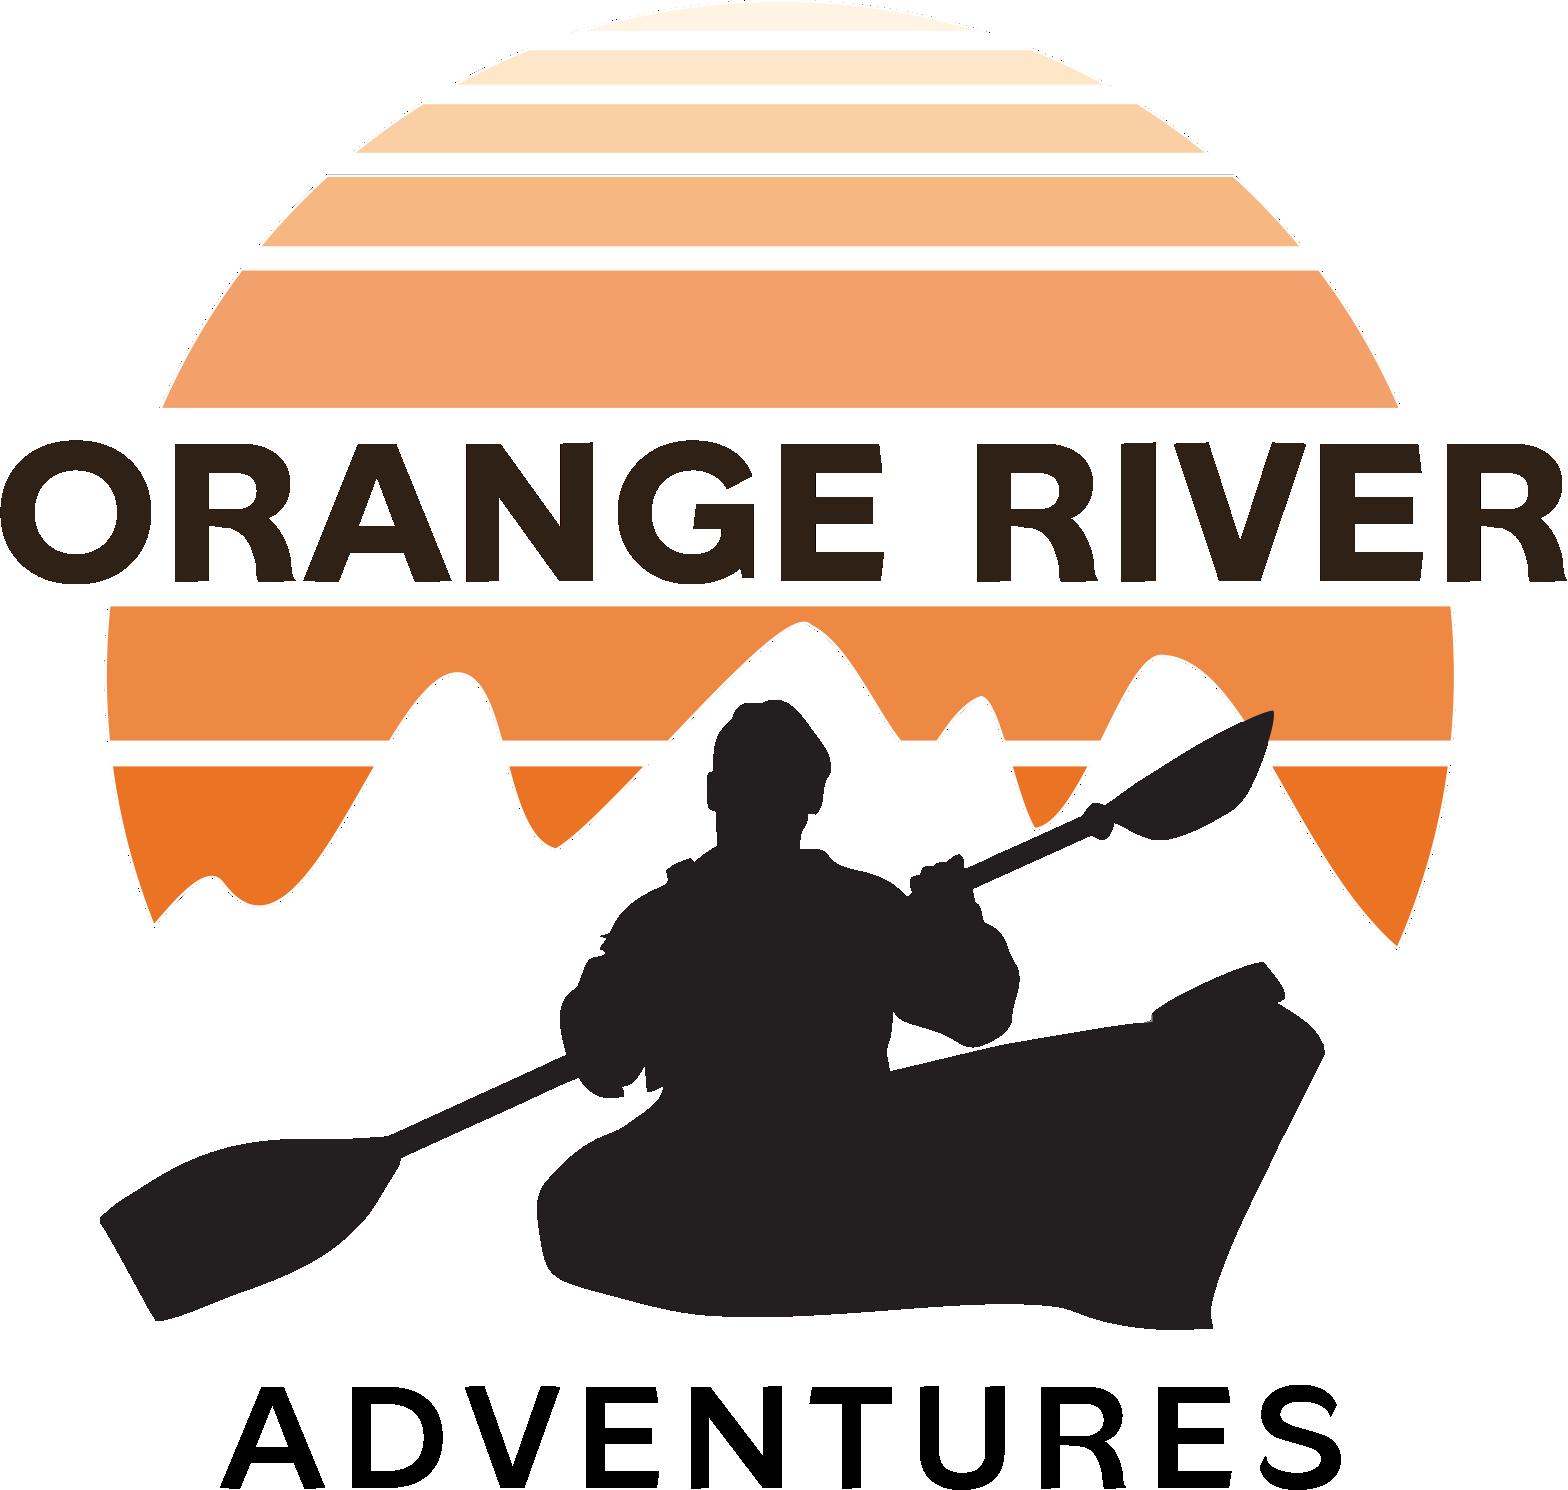 Orange River Rafting on the longest river of South Afrika | Hungary Winter Wonderland - Orange River Rafting on the longest river of South Afrika